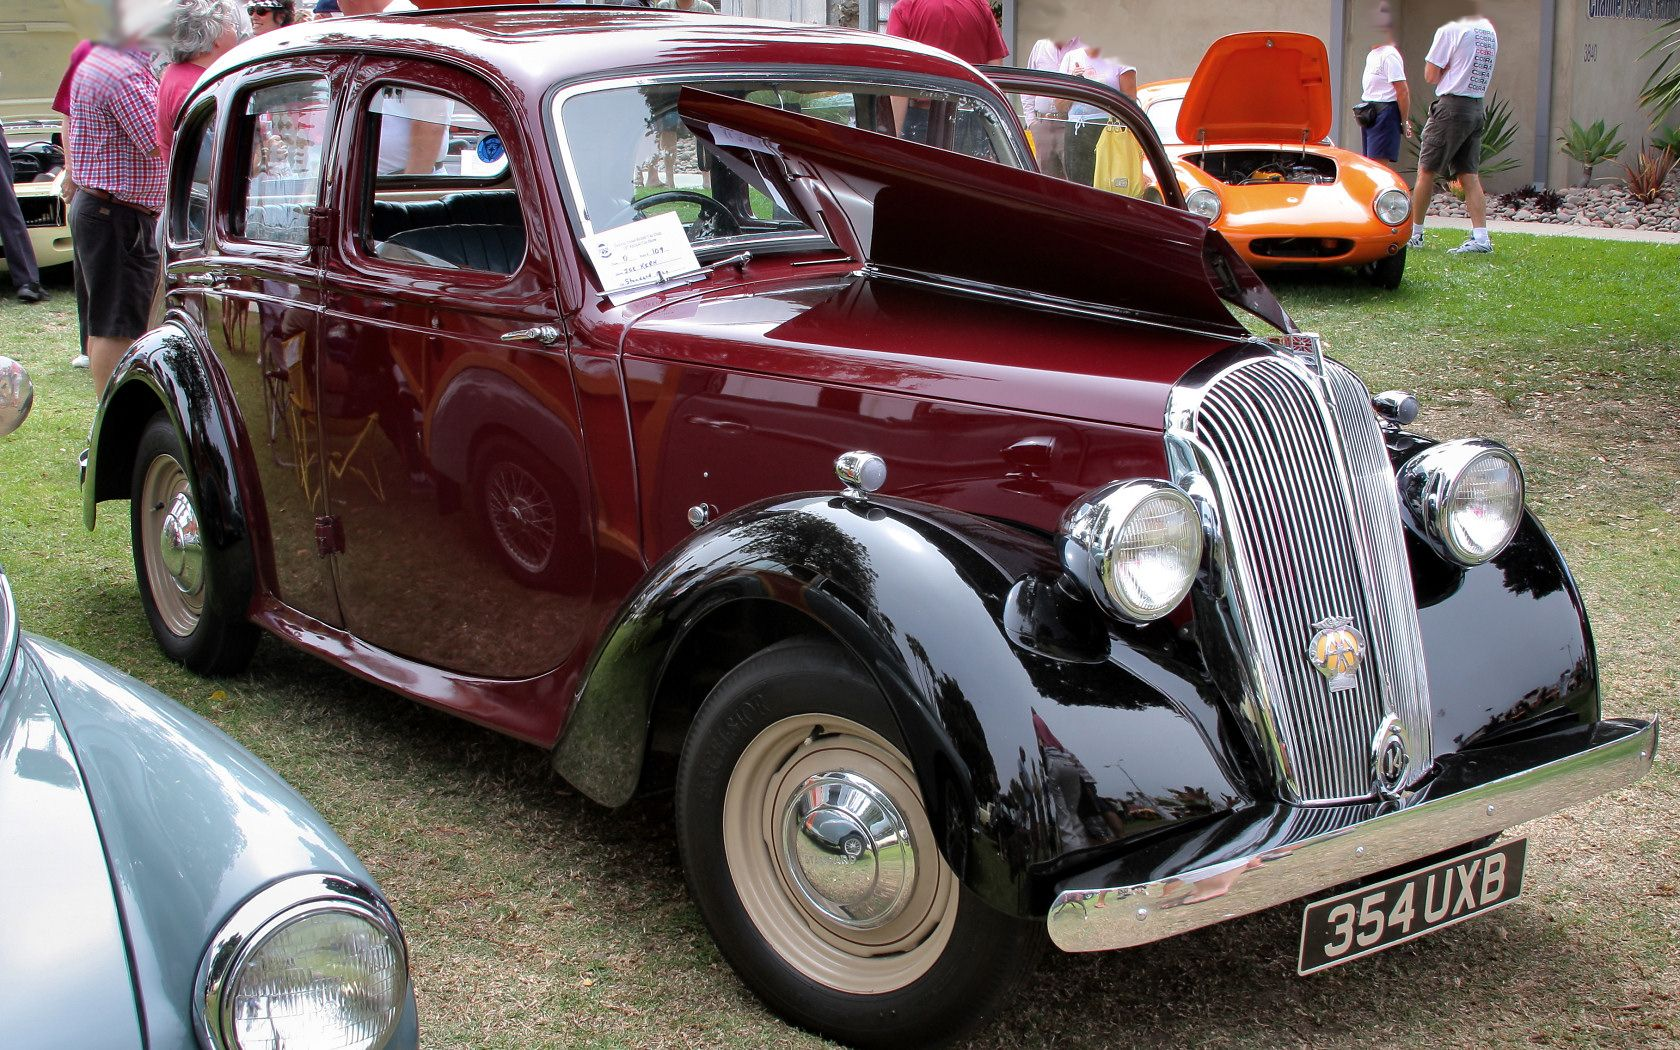 1948 Standard Fourteen 4door saloon Triumph cars, Motor